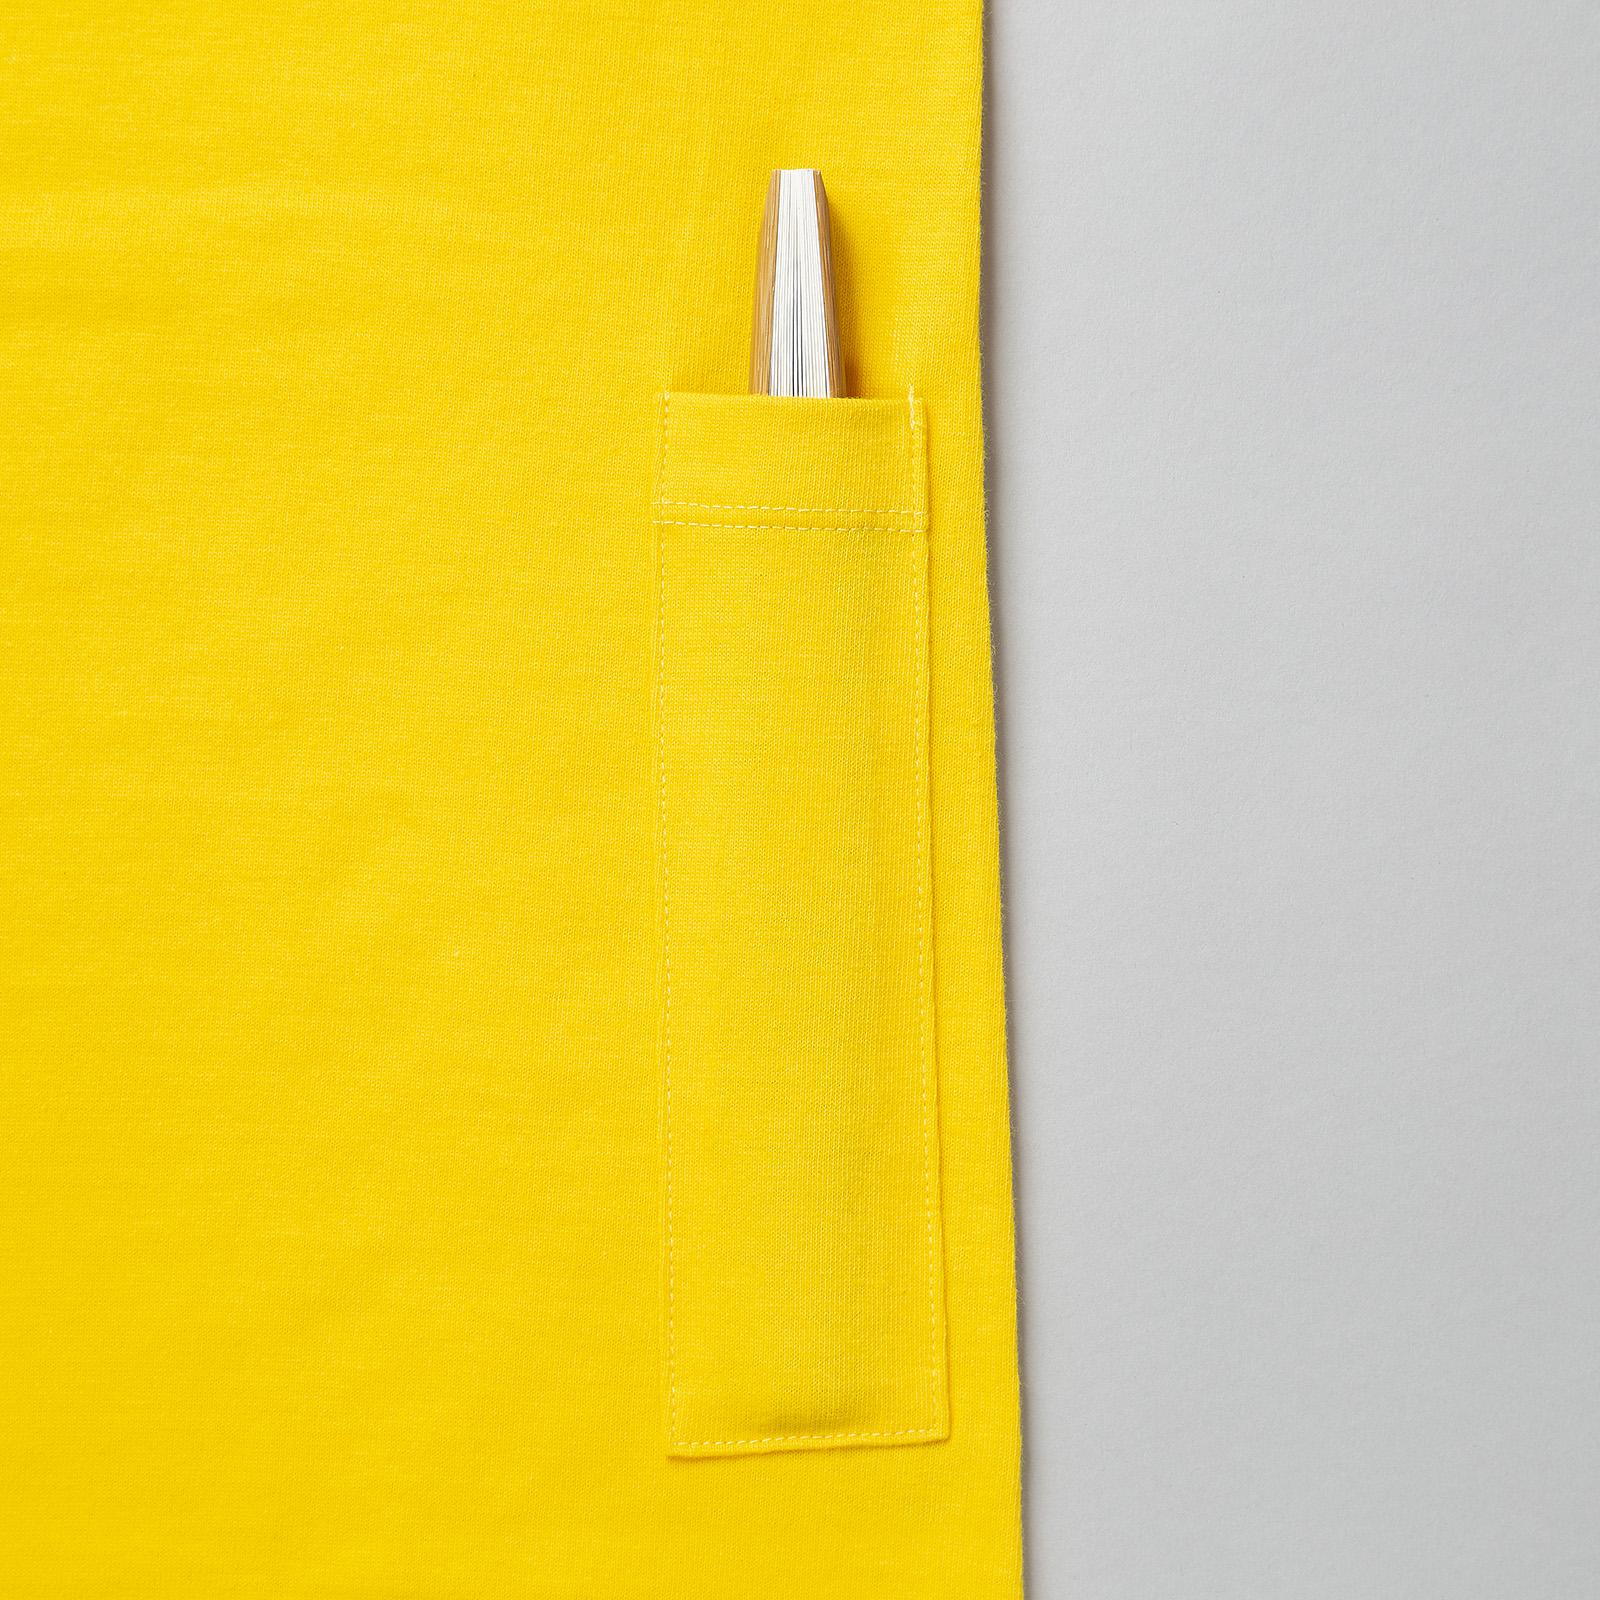 %e3%80%8cbanana-to-yellow%e3%80%8d-14-2